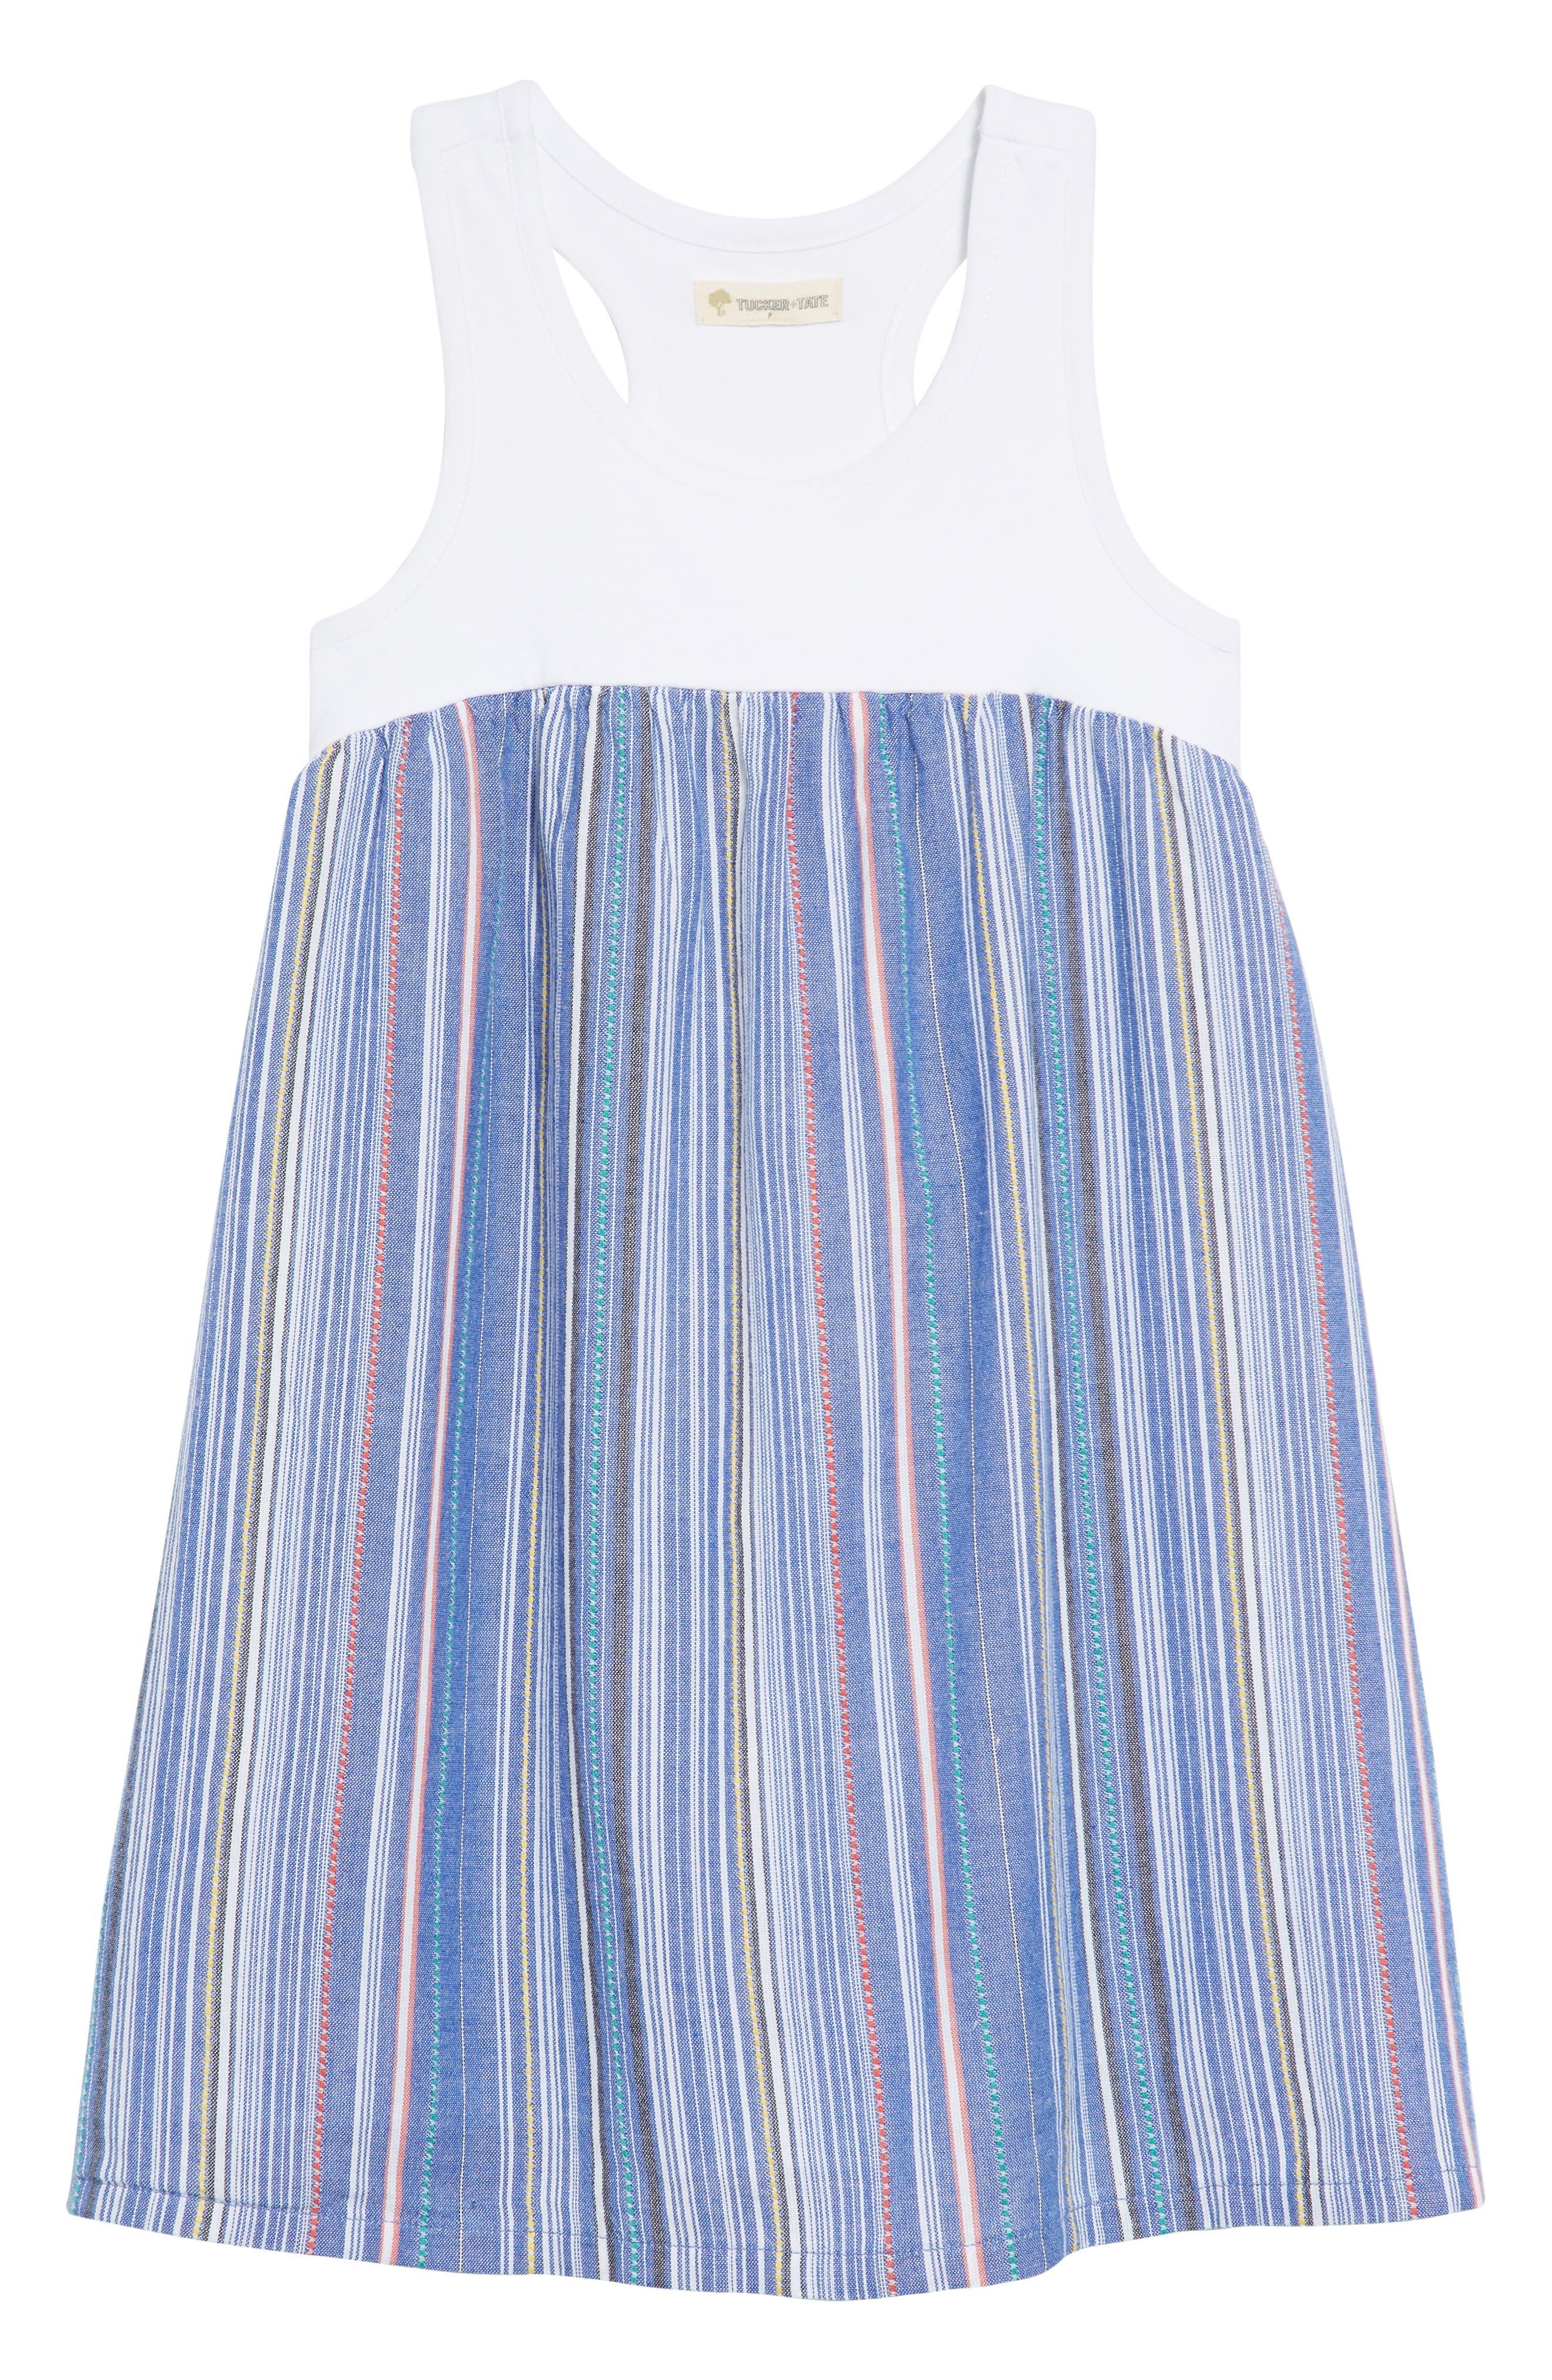 Racerback Tank Dress,                         Main,                         color, 420